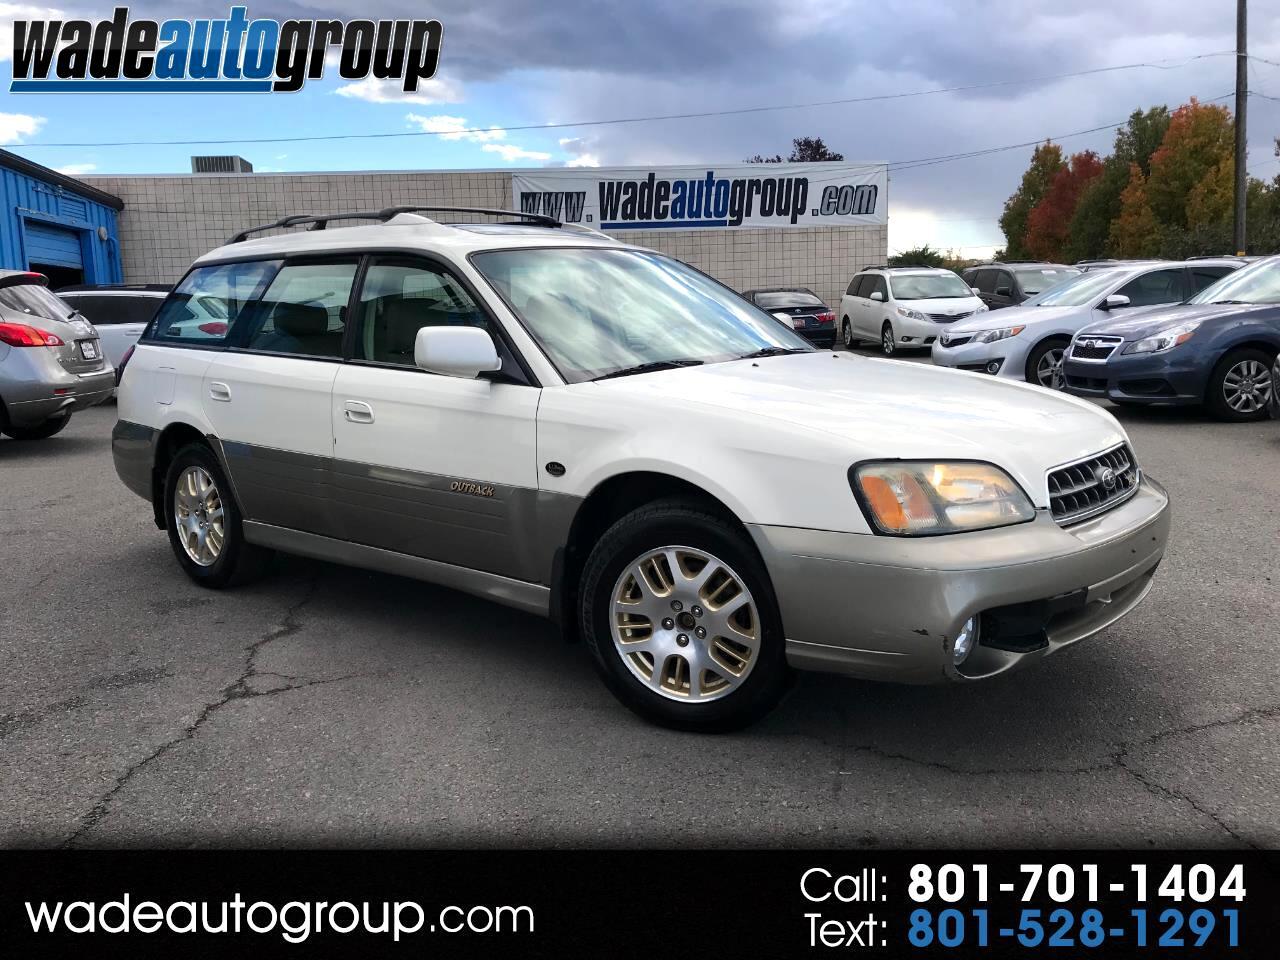 2003 Subaru Outback H6-3.0 L.L. Bean Edition Wagon